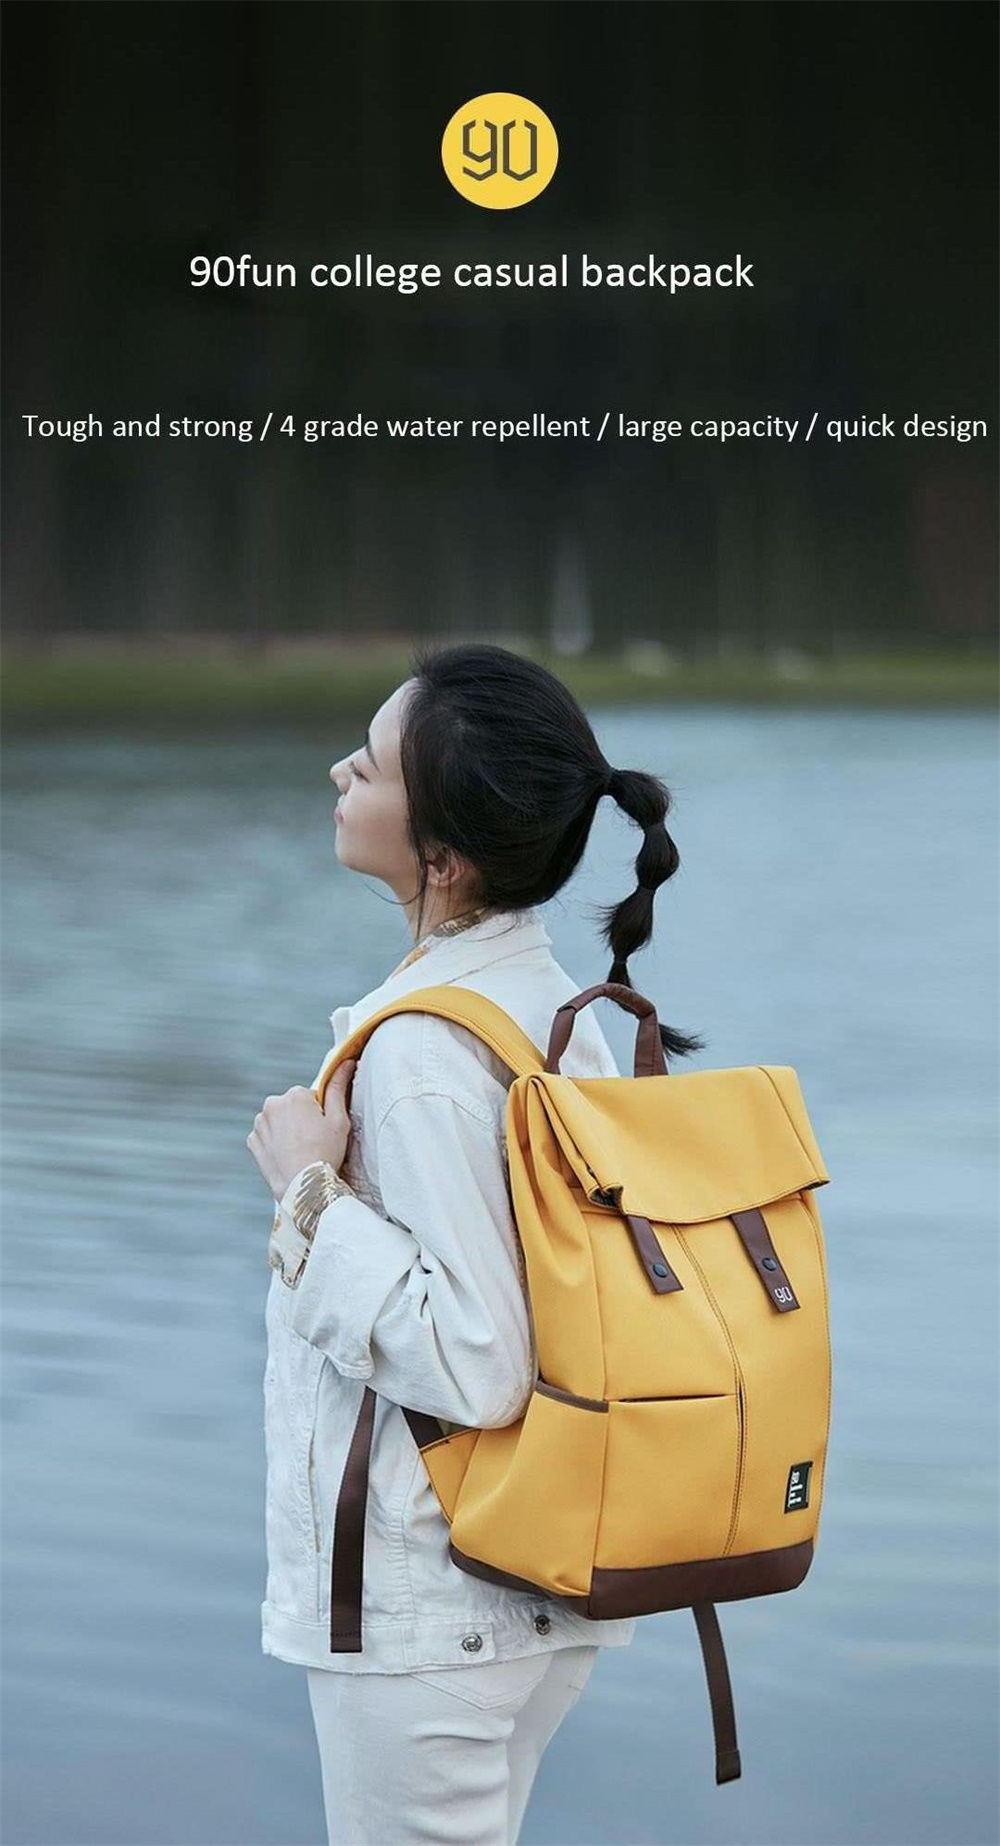 [Image: Xiaomi-90fun-College-Leisure-Backpack-1.jpg]